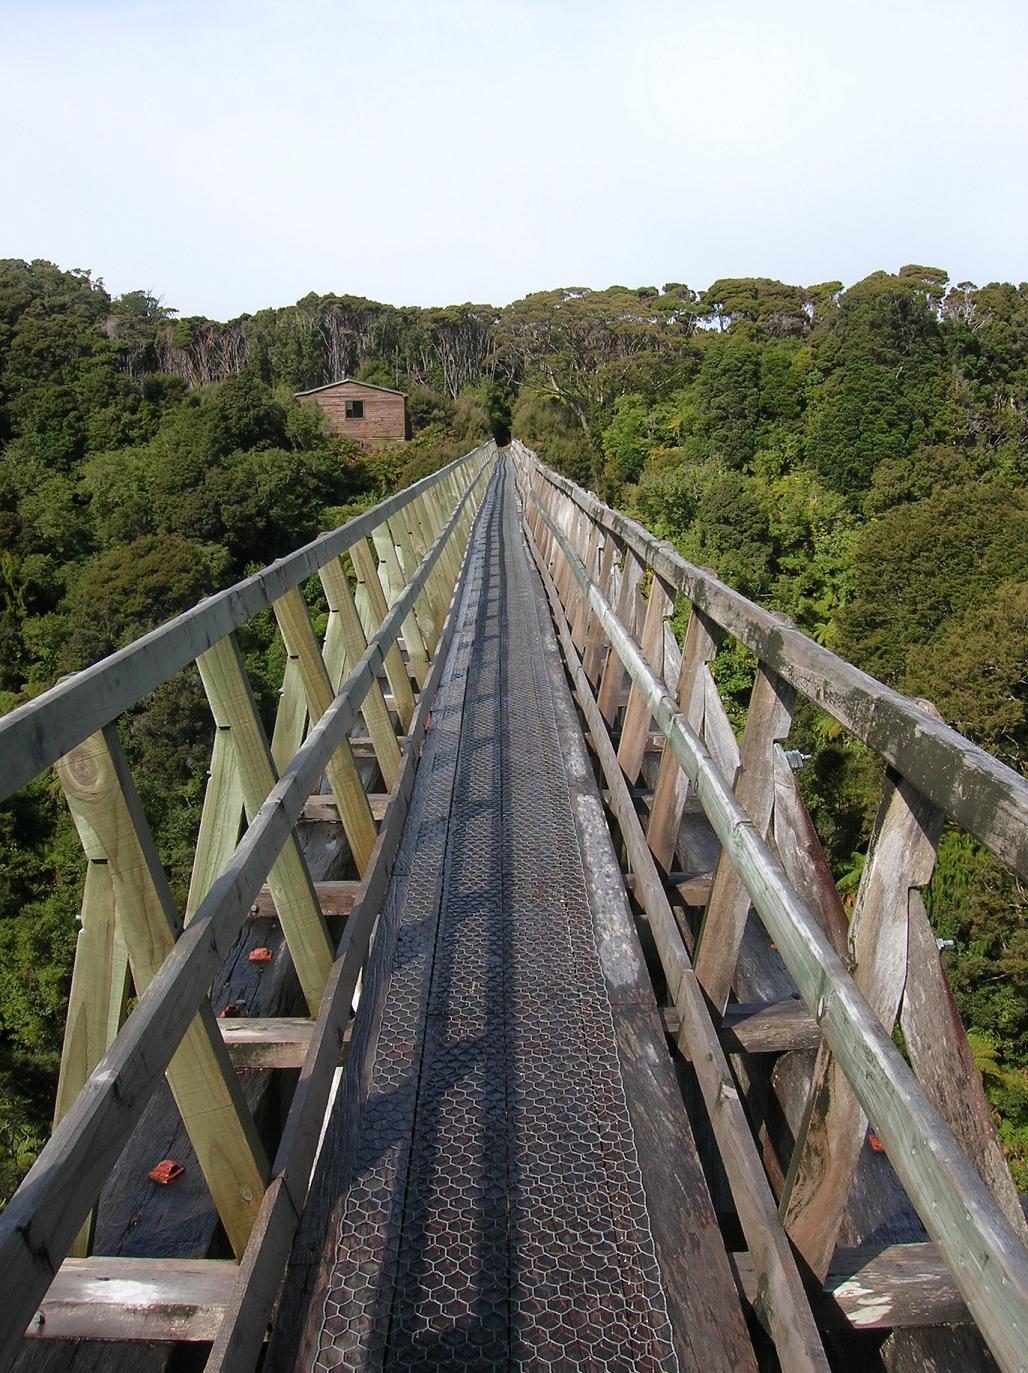 Das große Viadukt